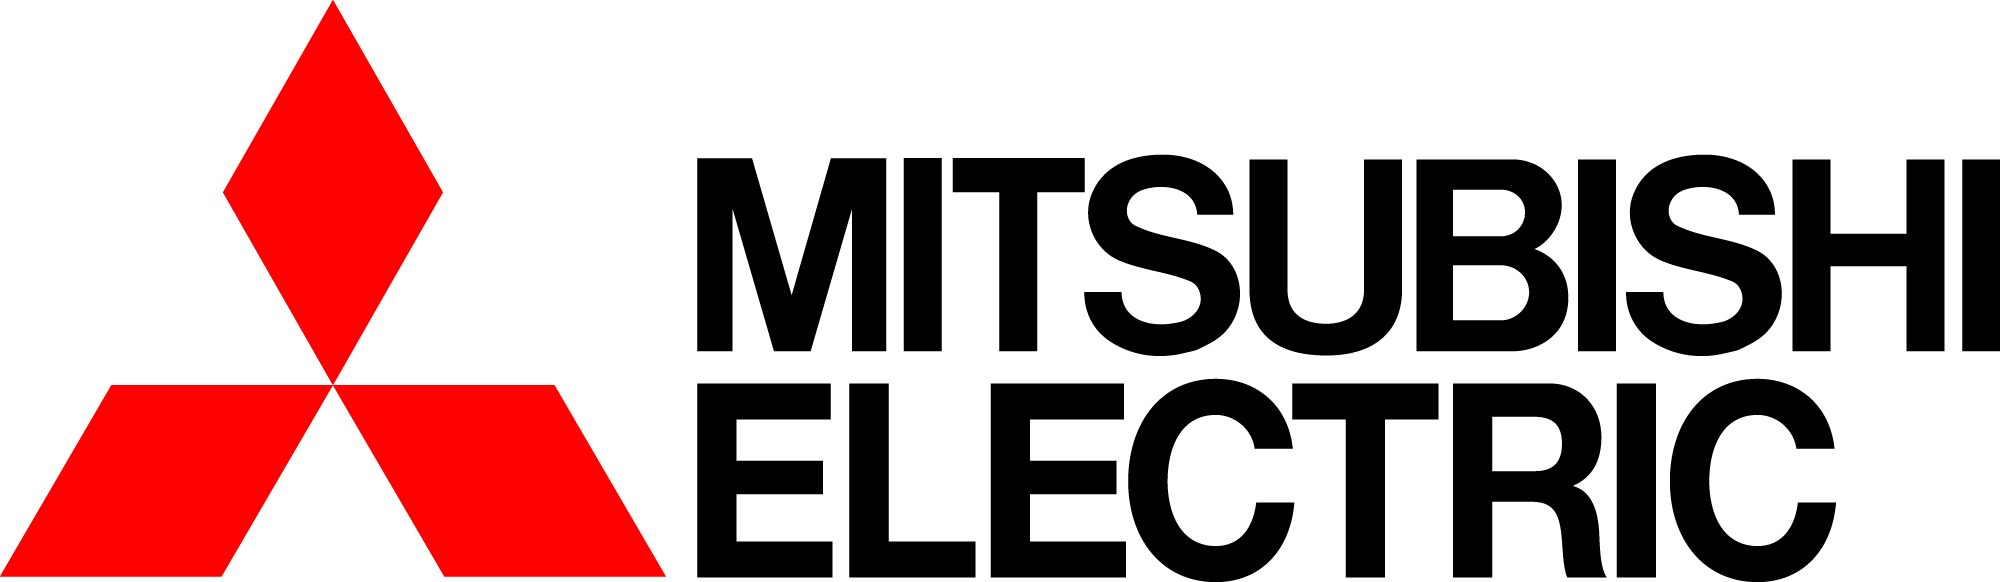 mitsubishielectric-shortblack-cmyk.jpg